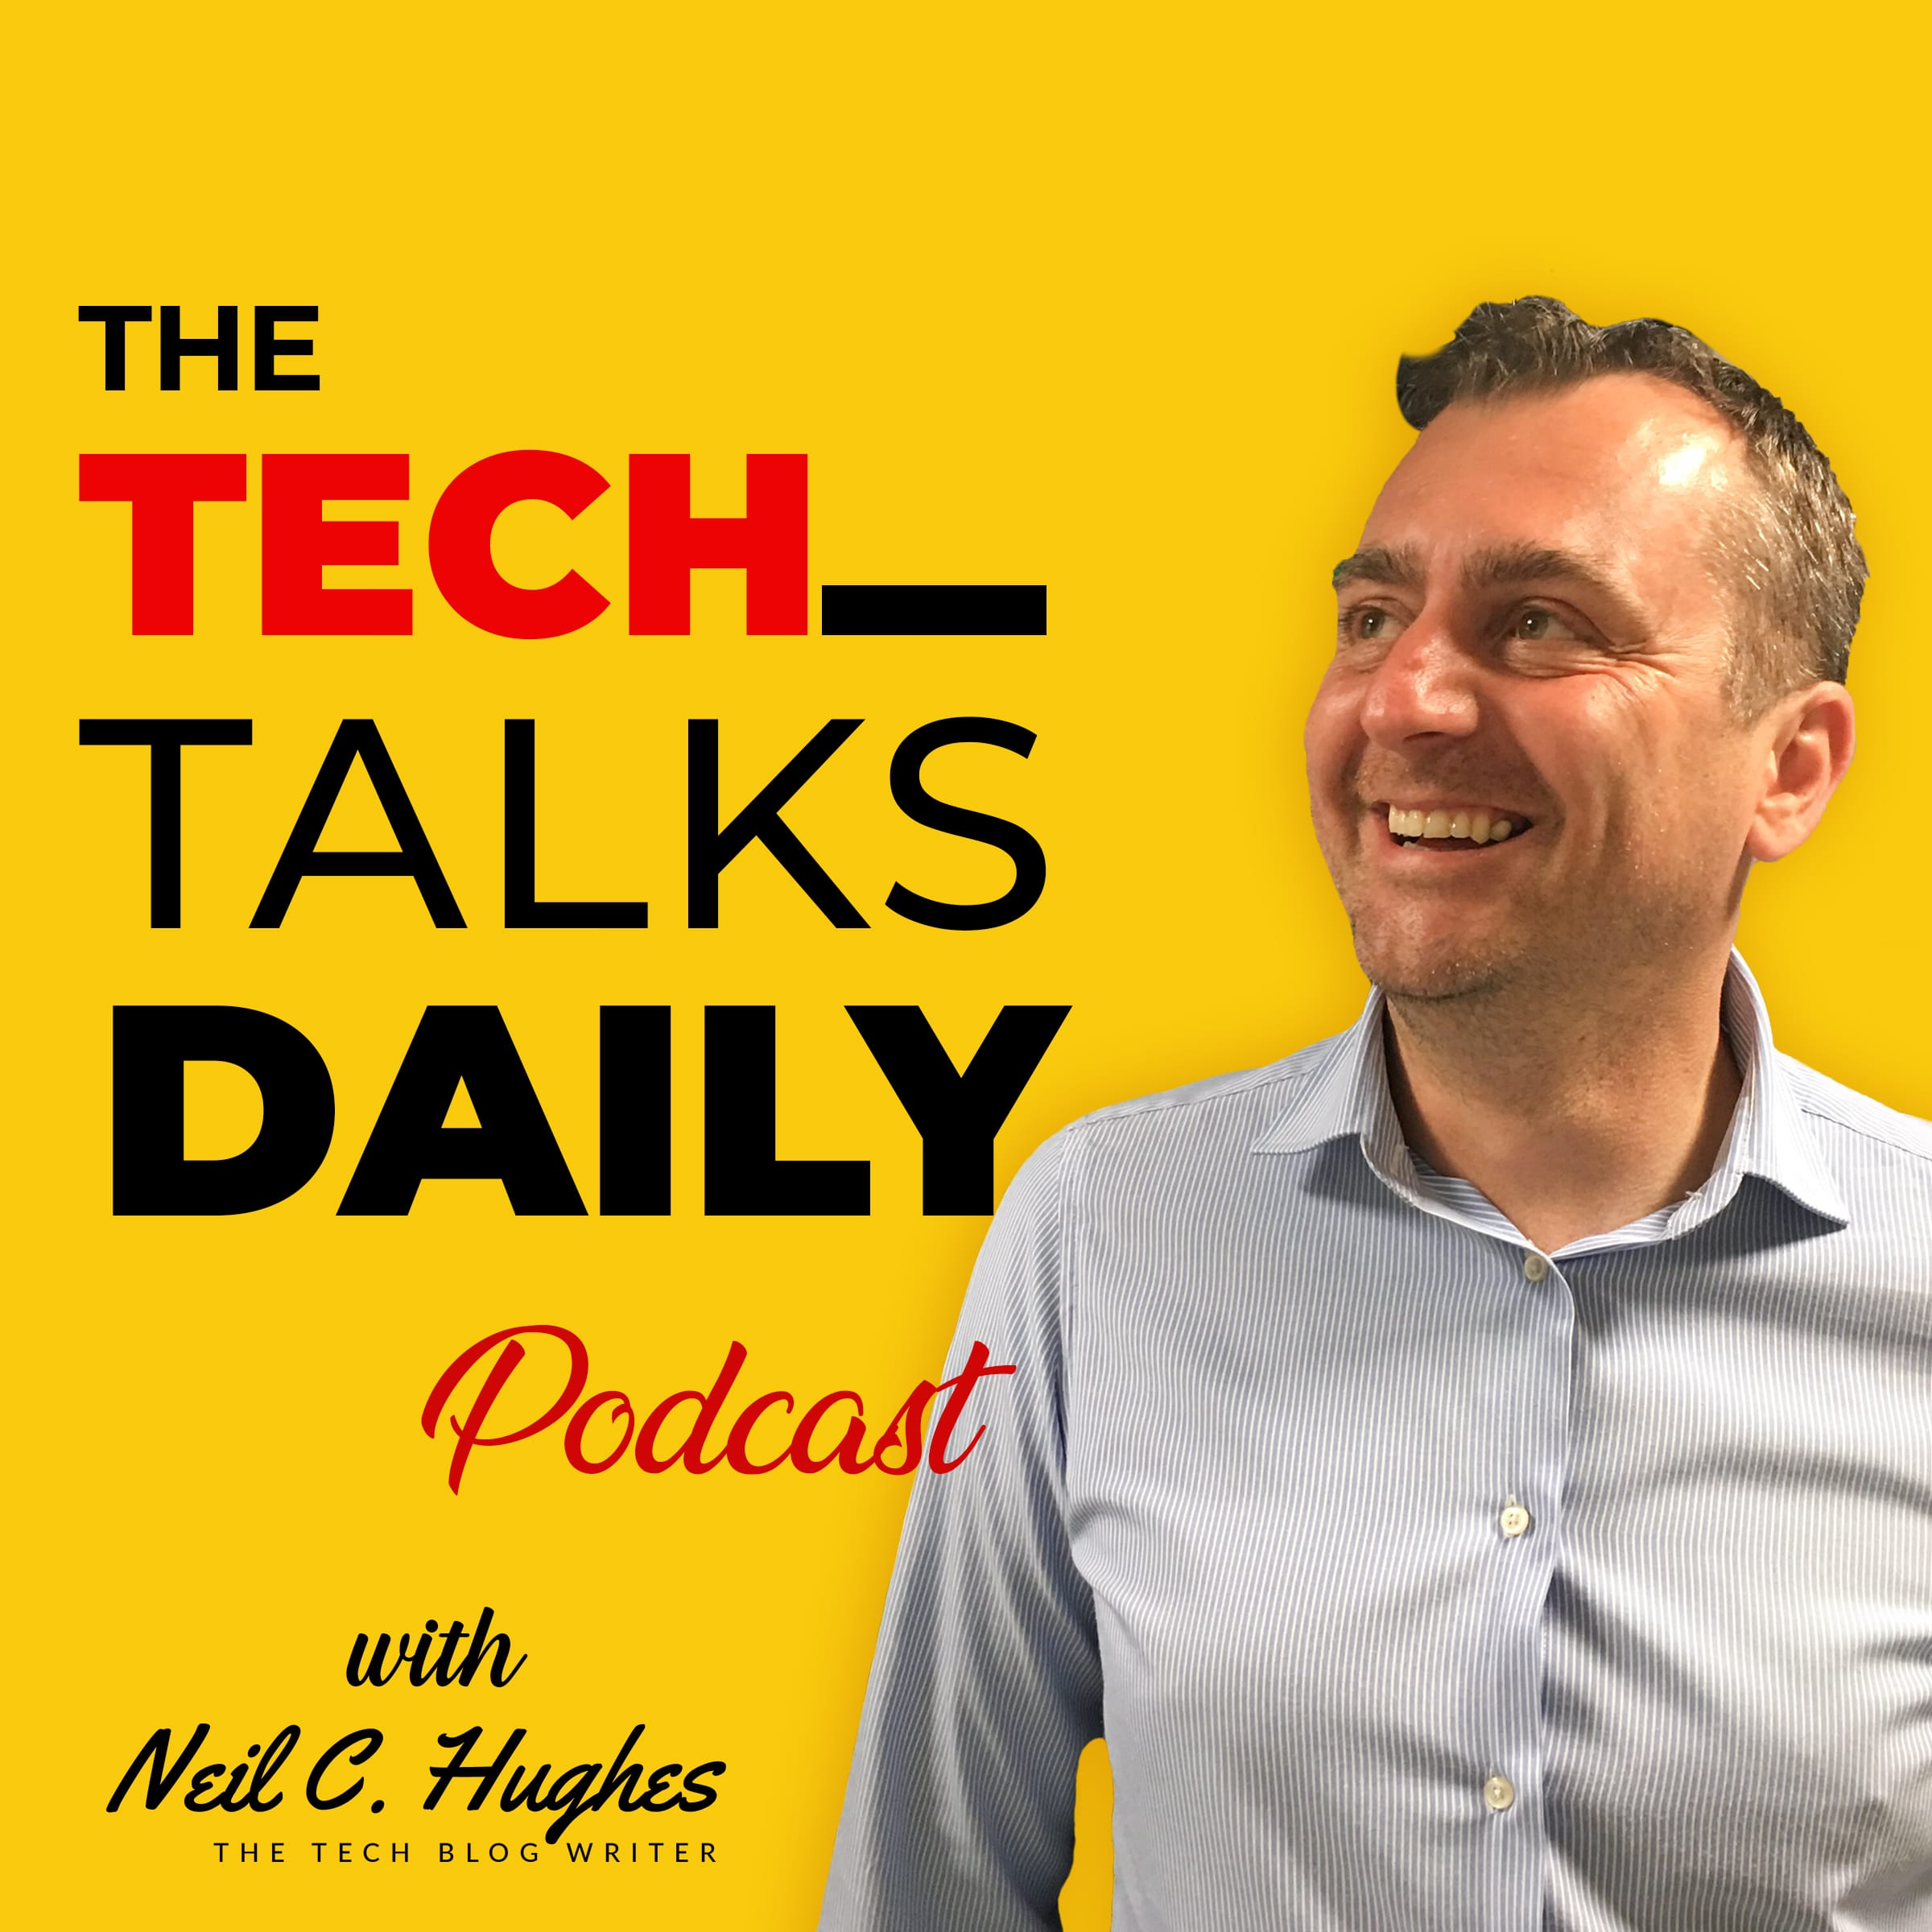 The Tech Talks Daily Podcast show art